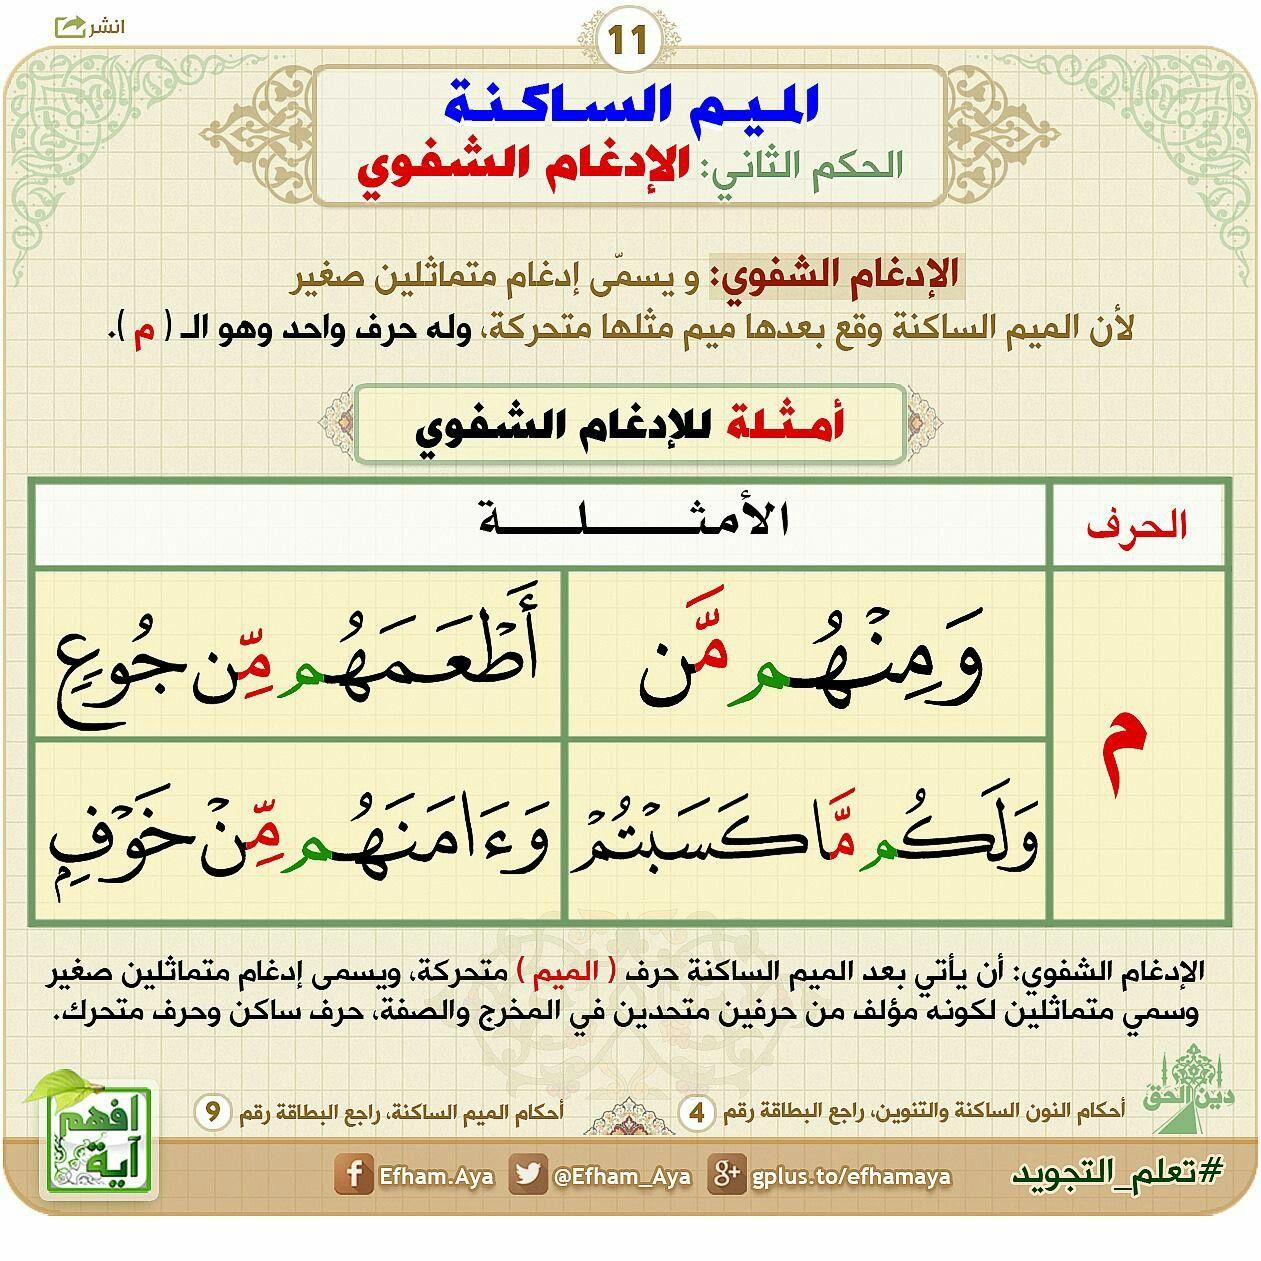 Pin By Afaf Jamal On كن من الذاكرين الله Tajweed Quran Quran Tafseer Letter Recognition Worksheets